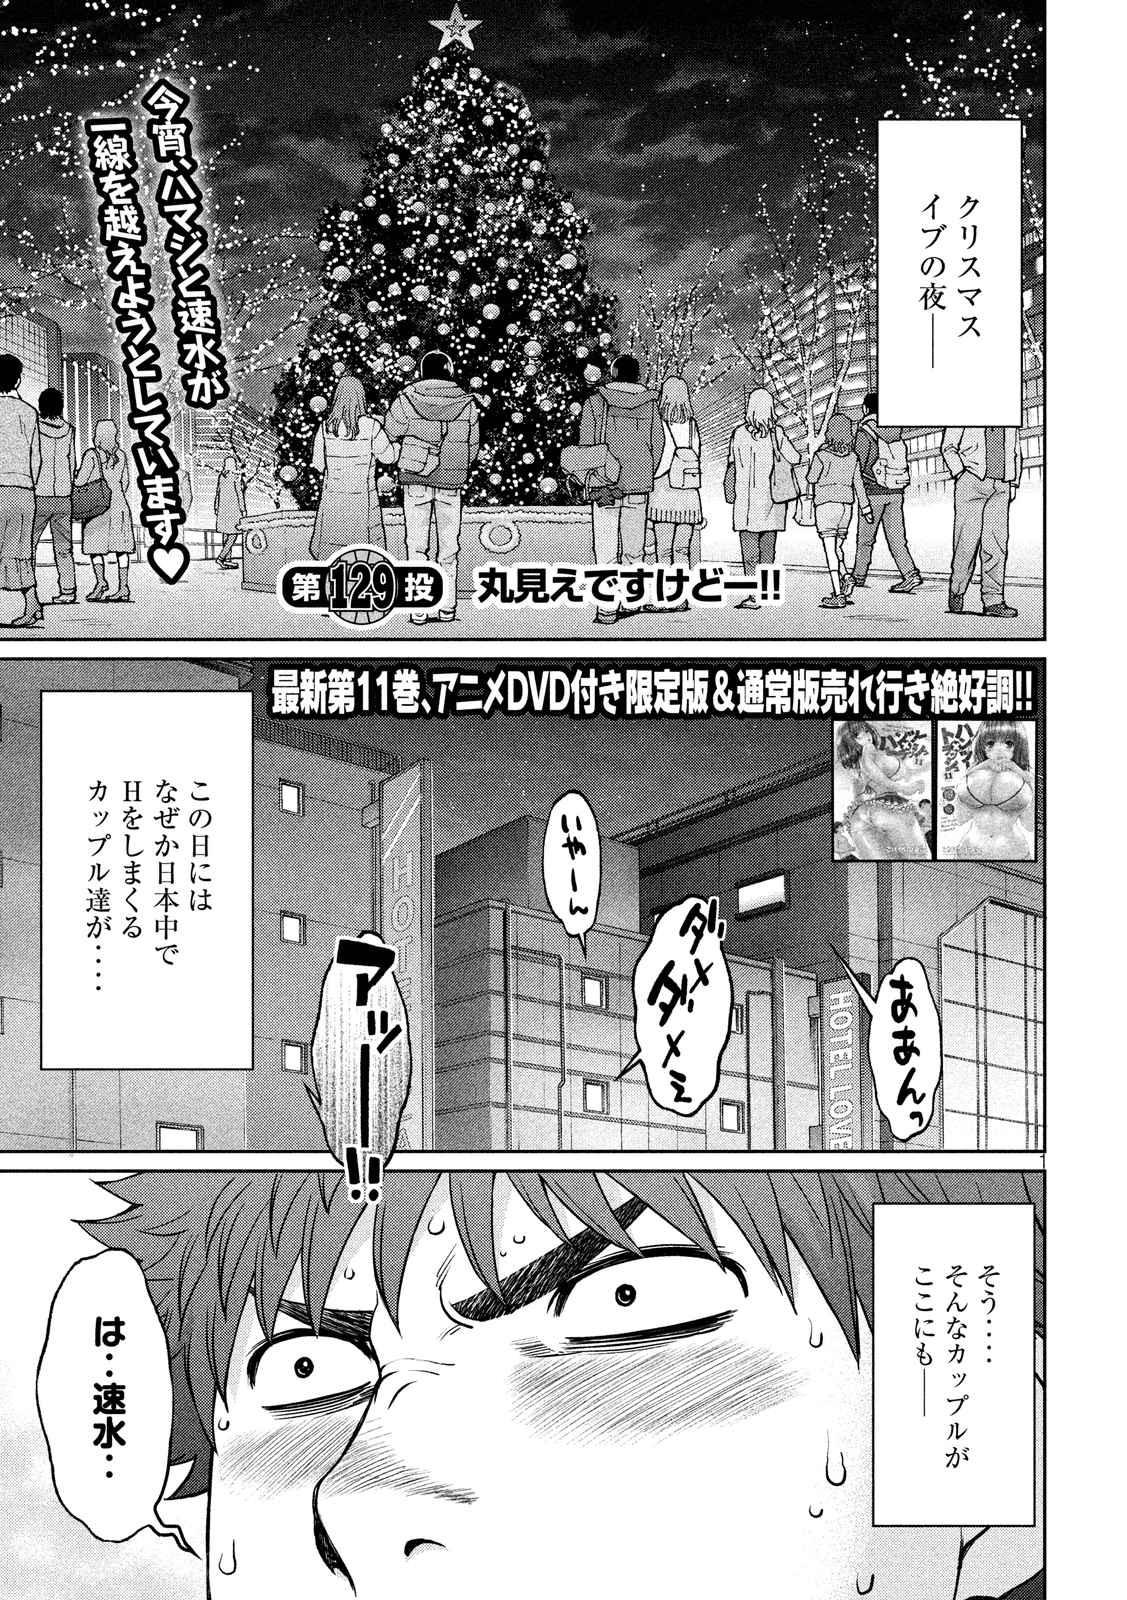 Hantsu_x_Trash Chapter 129 Page 1